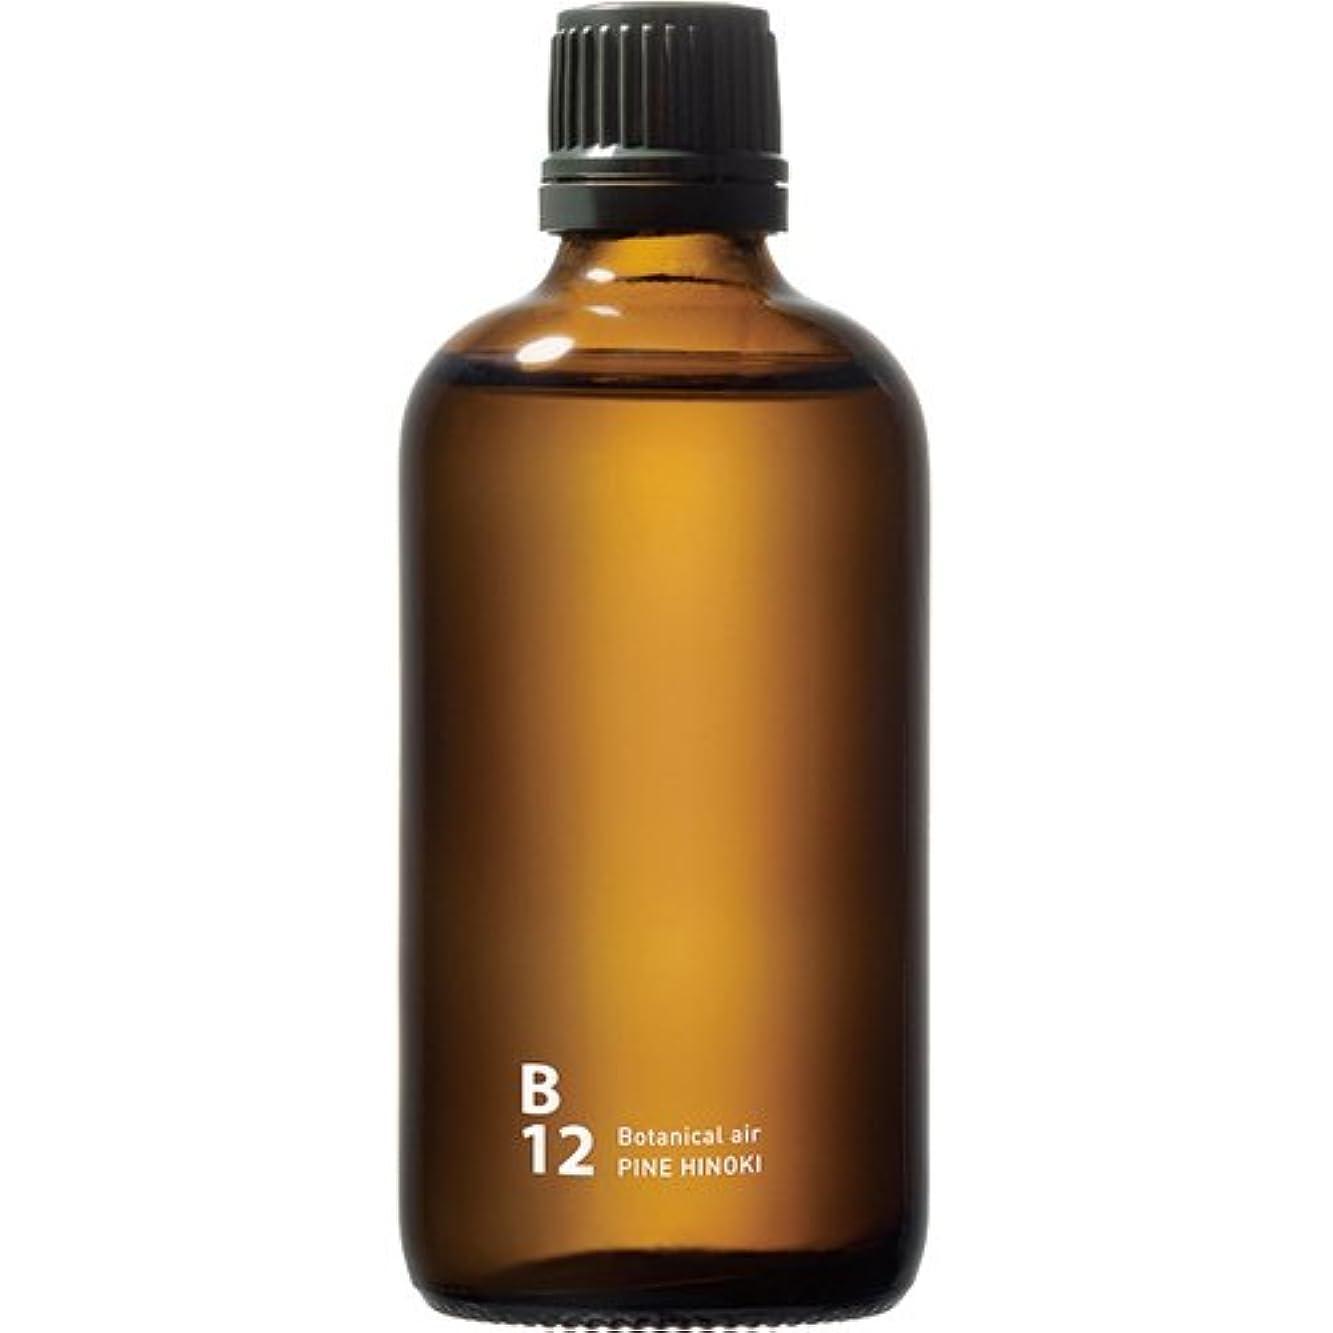 リア王太鼓腹着服B12 PINE HINOKI piezo aroma oil 100ml